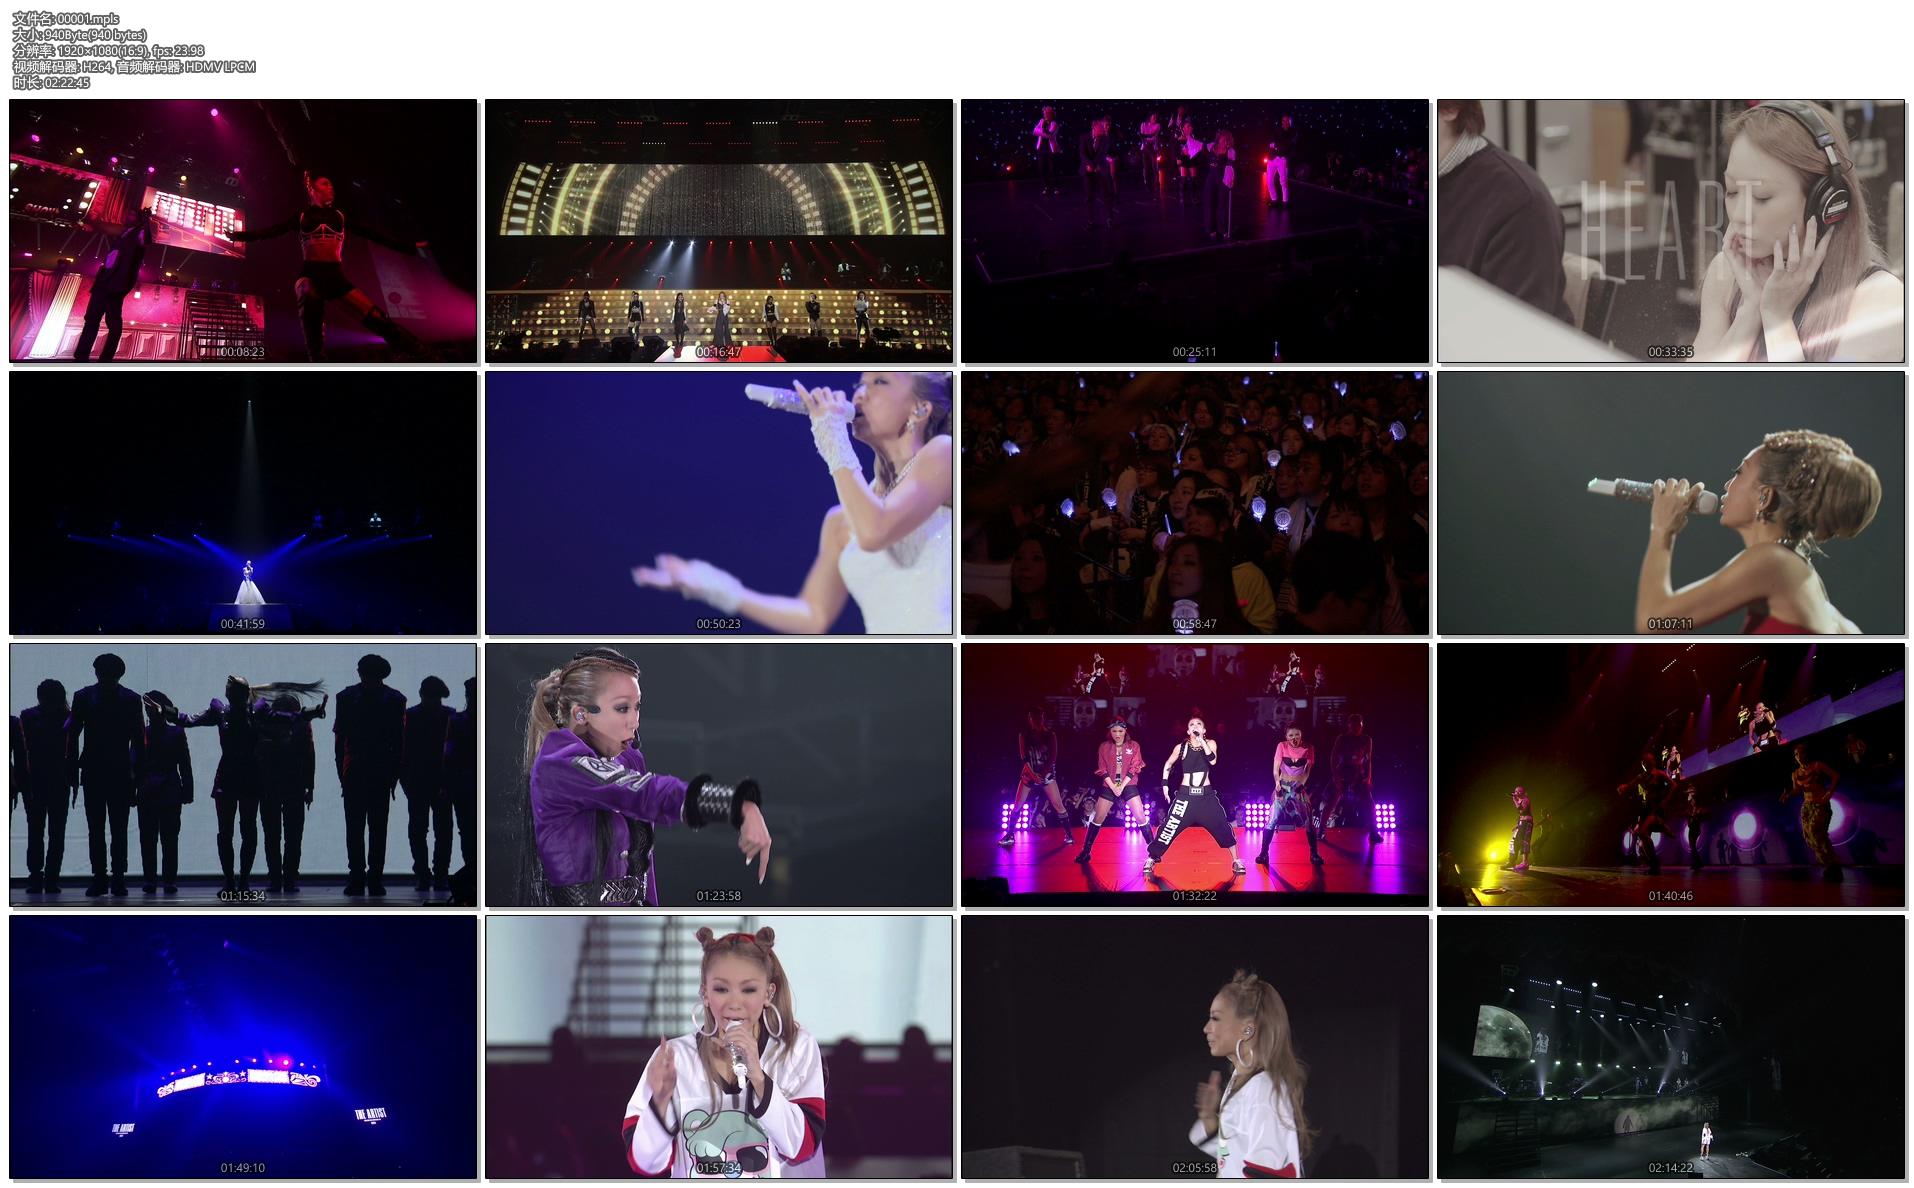 [蓝光原盘] 幸田来未 15周年纪念演唱会2015 Koda Kumi 15th Anniversary Live《ISO 38.9 GB》插图(1)